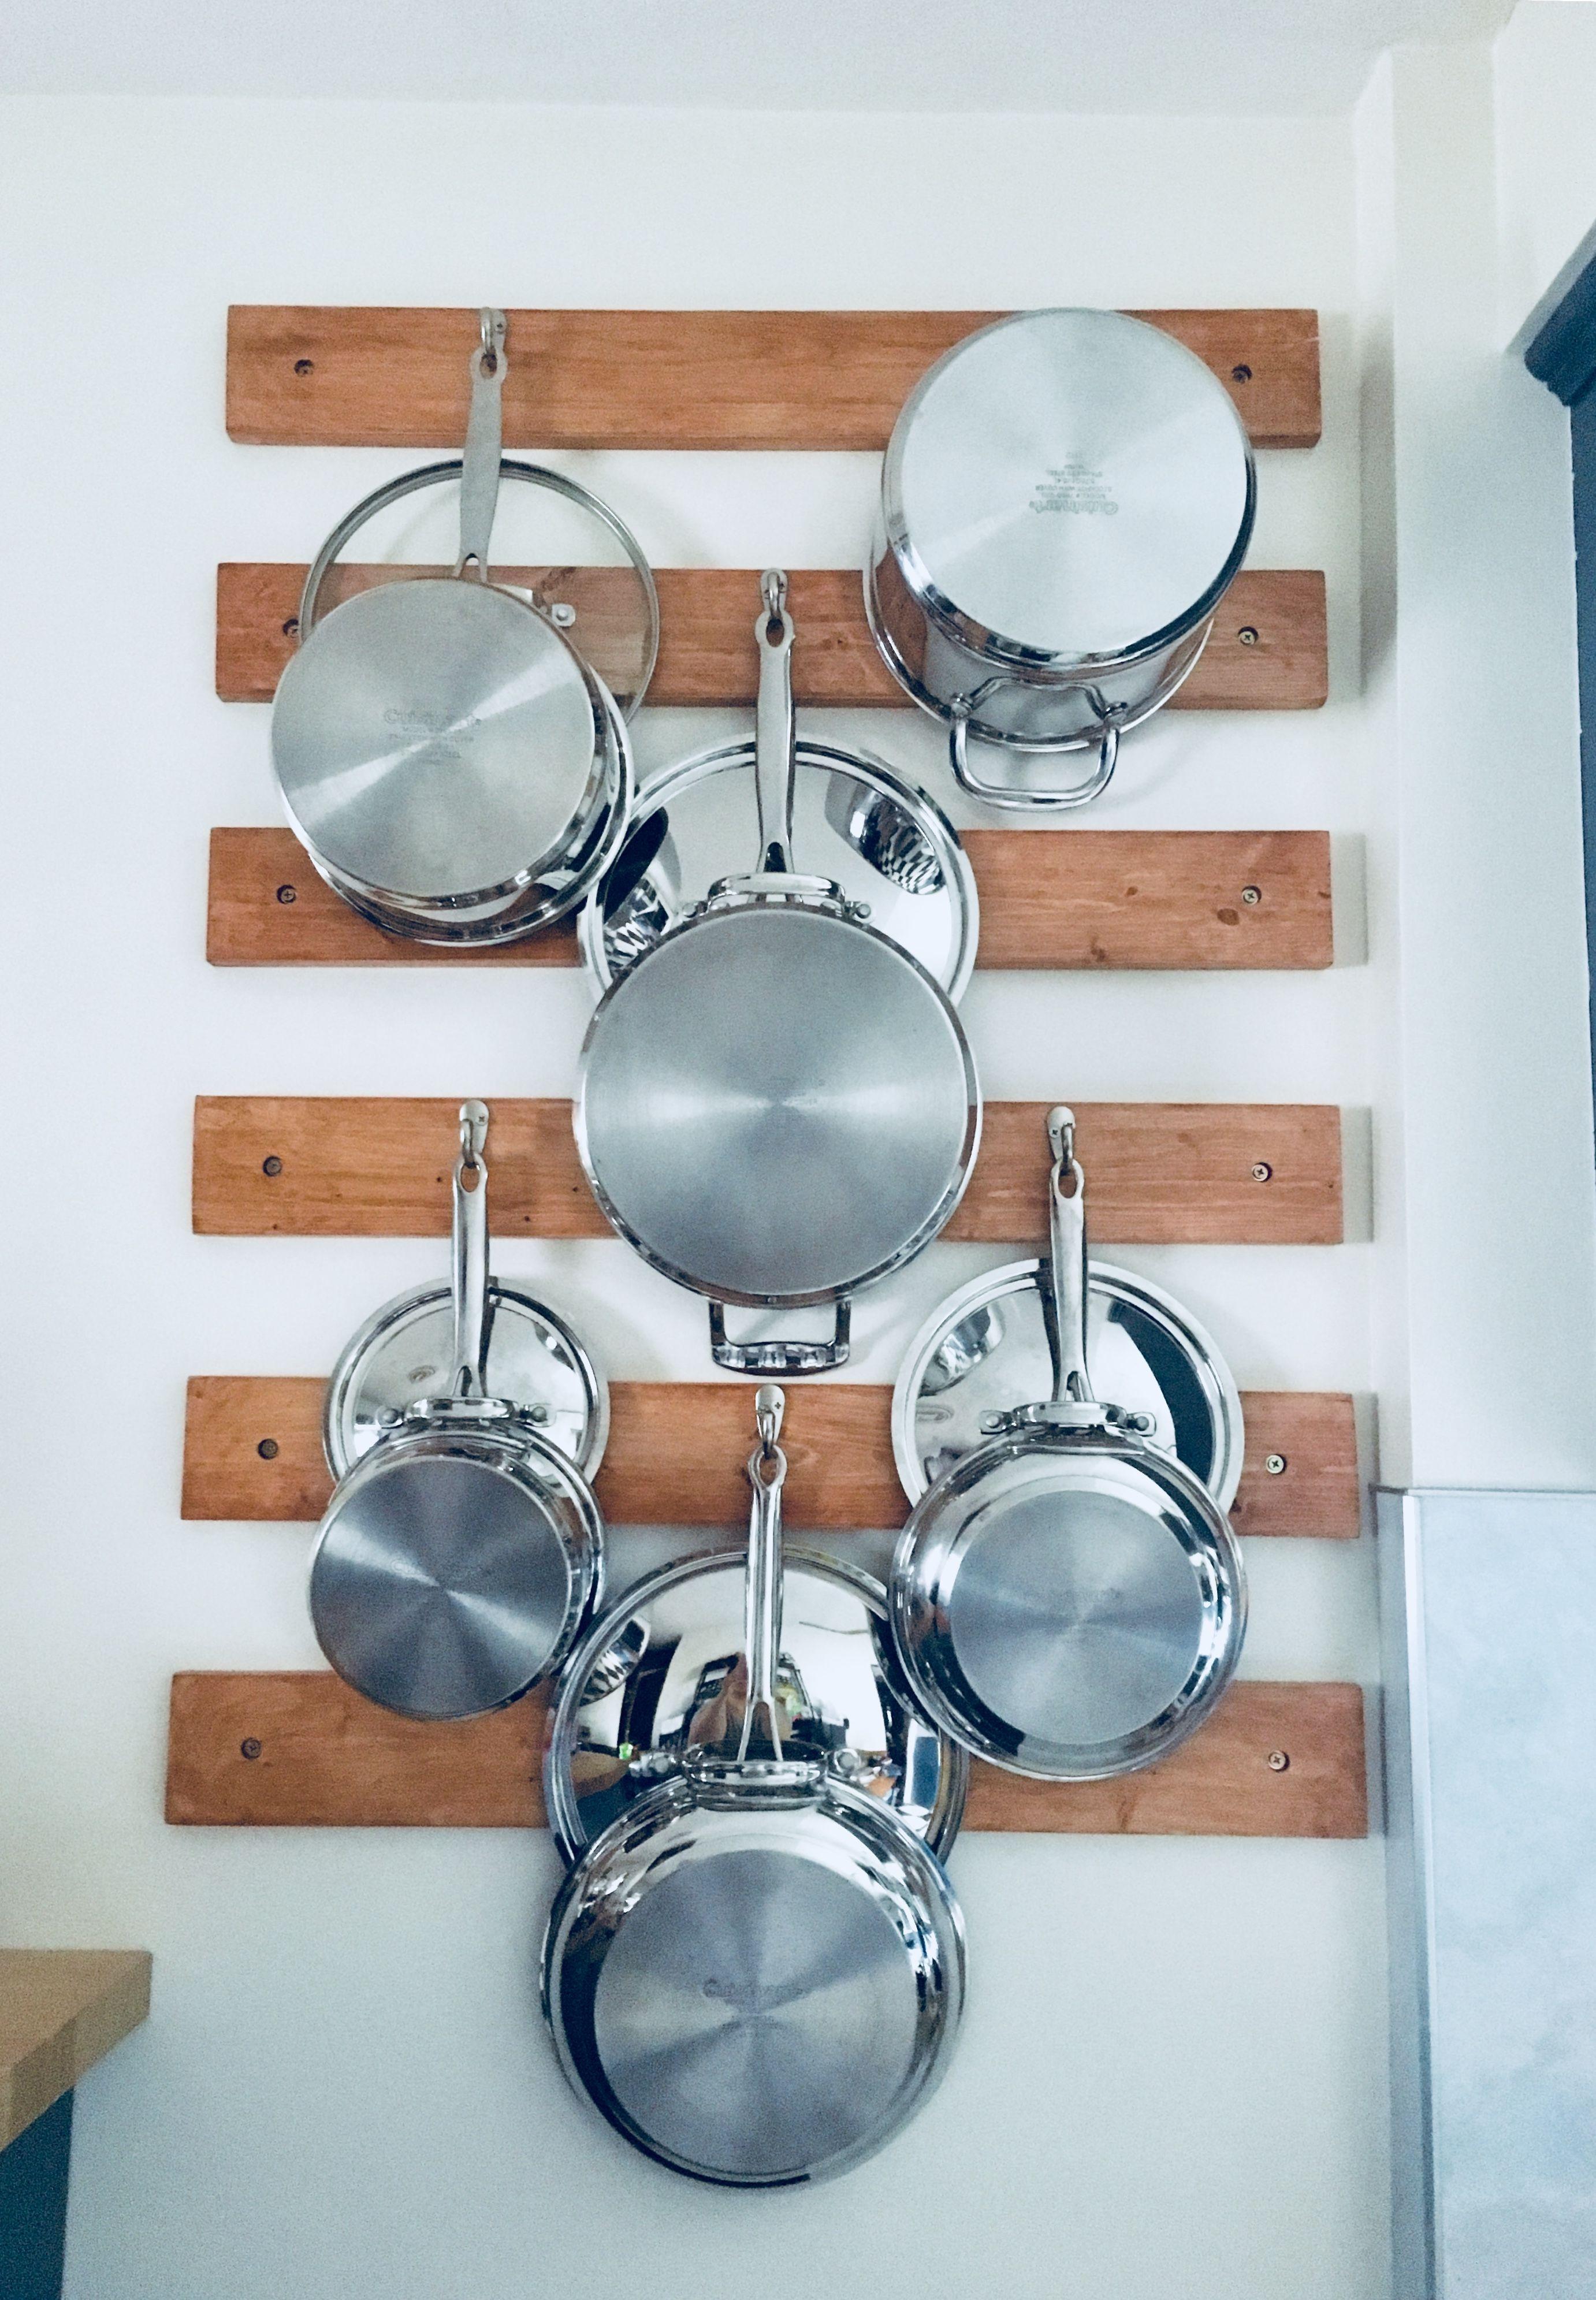 Diy Wall Mounted Pot Rack Kitchen Wall Hangings Pot Hanger